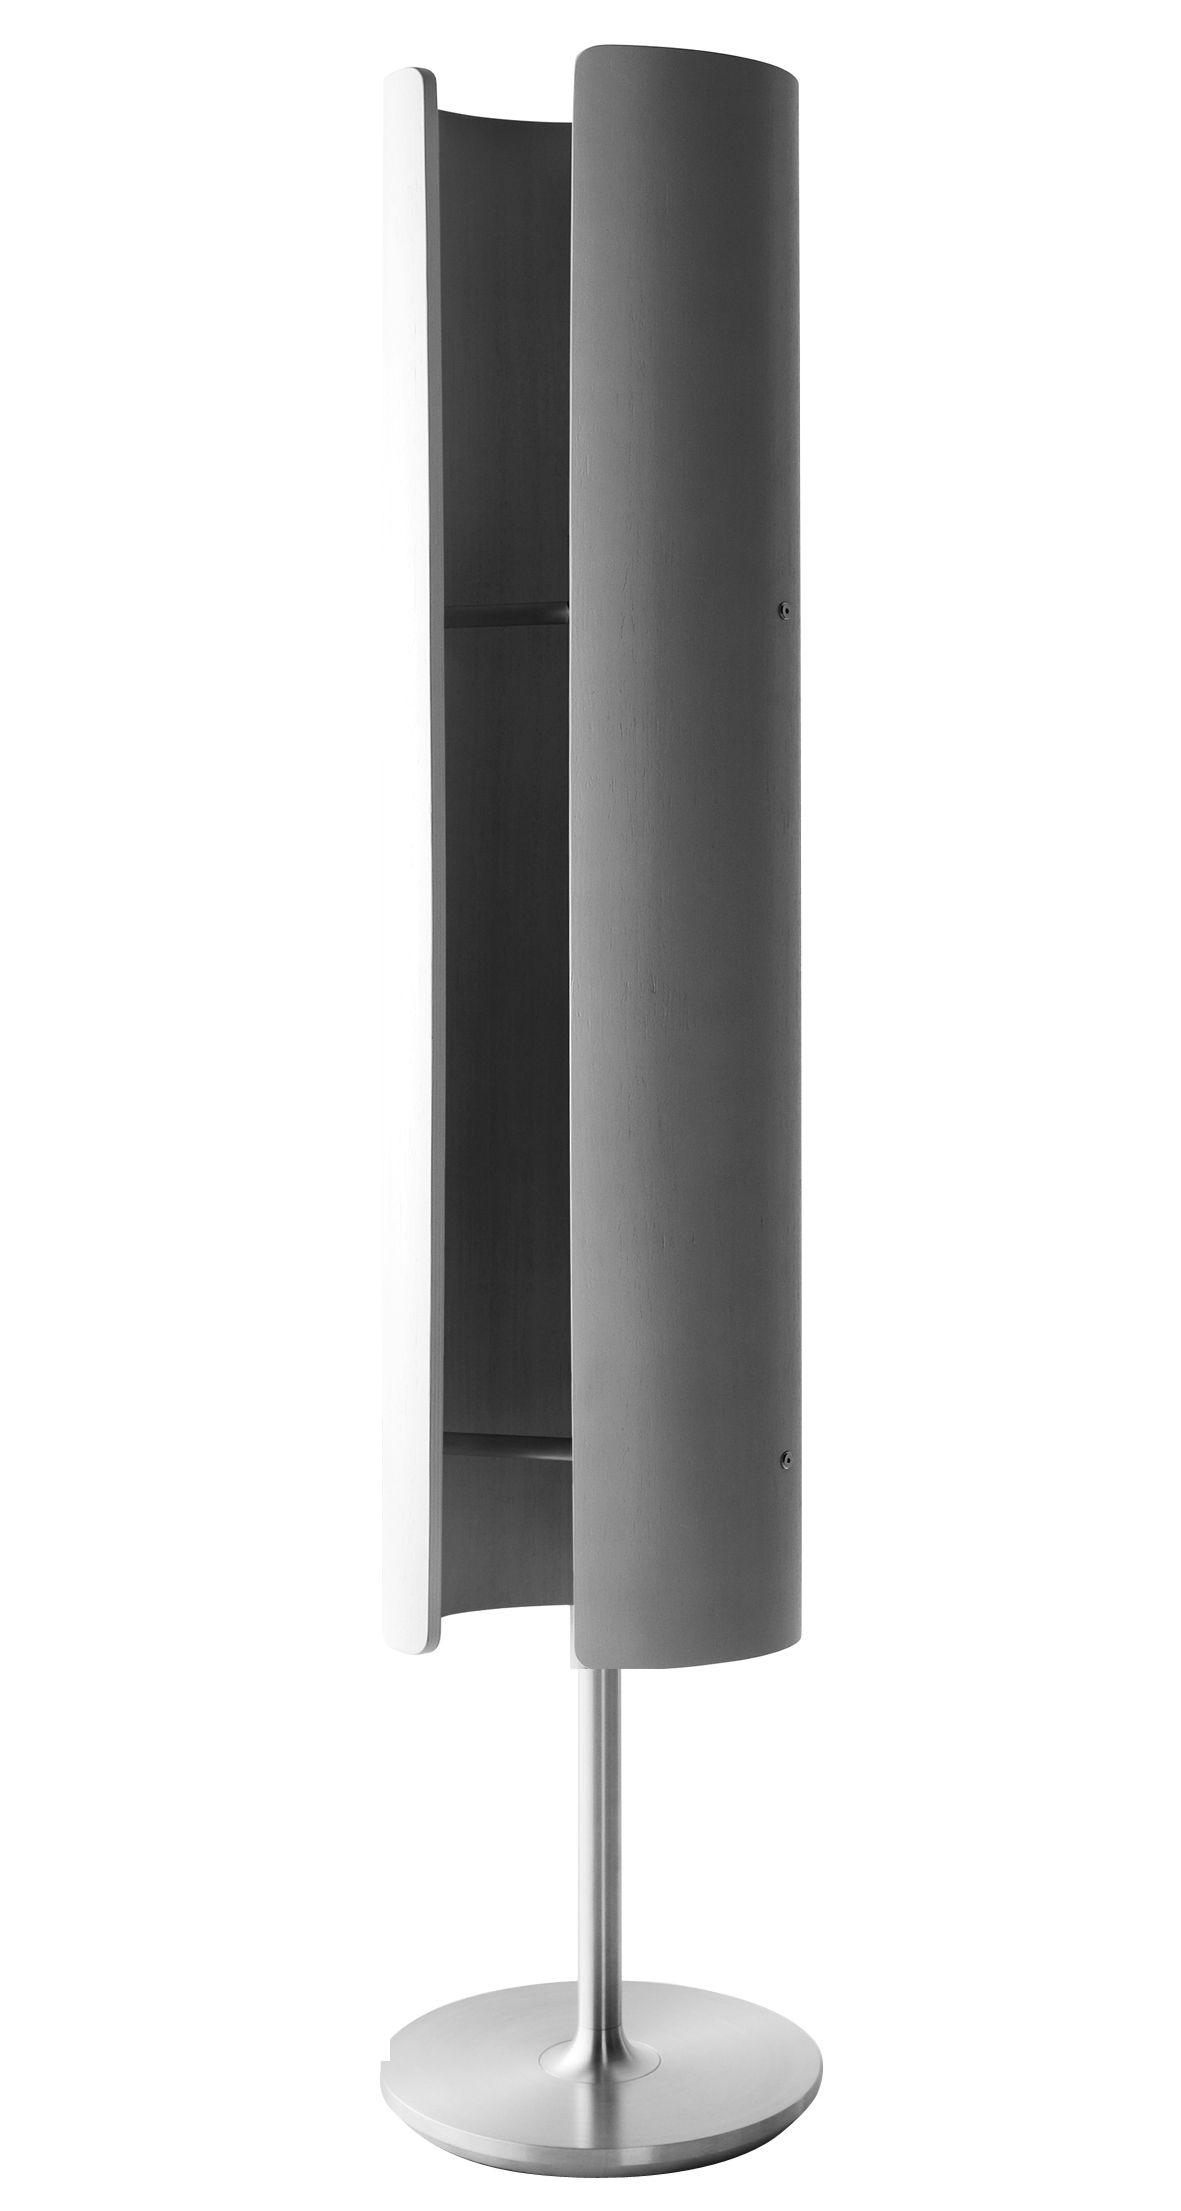 radiateur totem infrarouge et mobile h 170 cm ch ne teint gris i radium. Black Bedroom Furniture Sets. Home Design Ideas